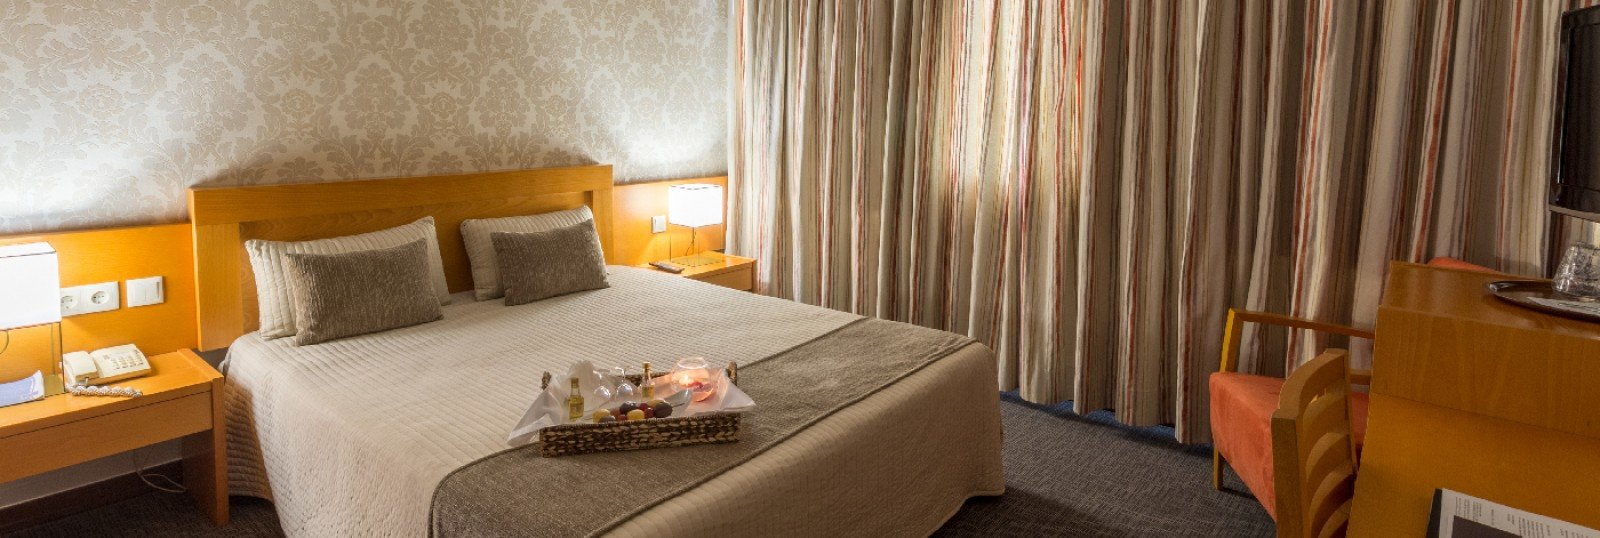 Hotel Eurosol Leiria double room